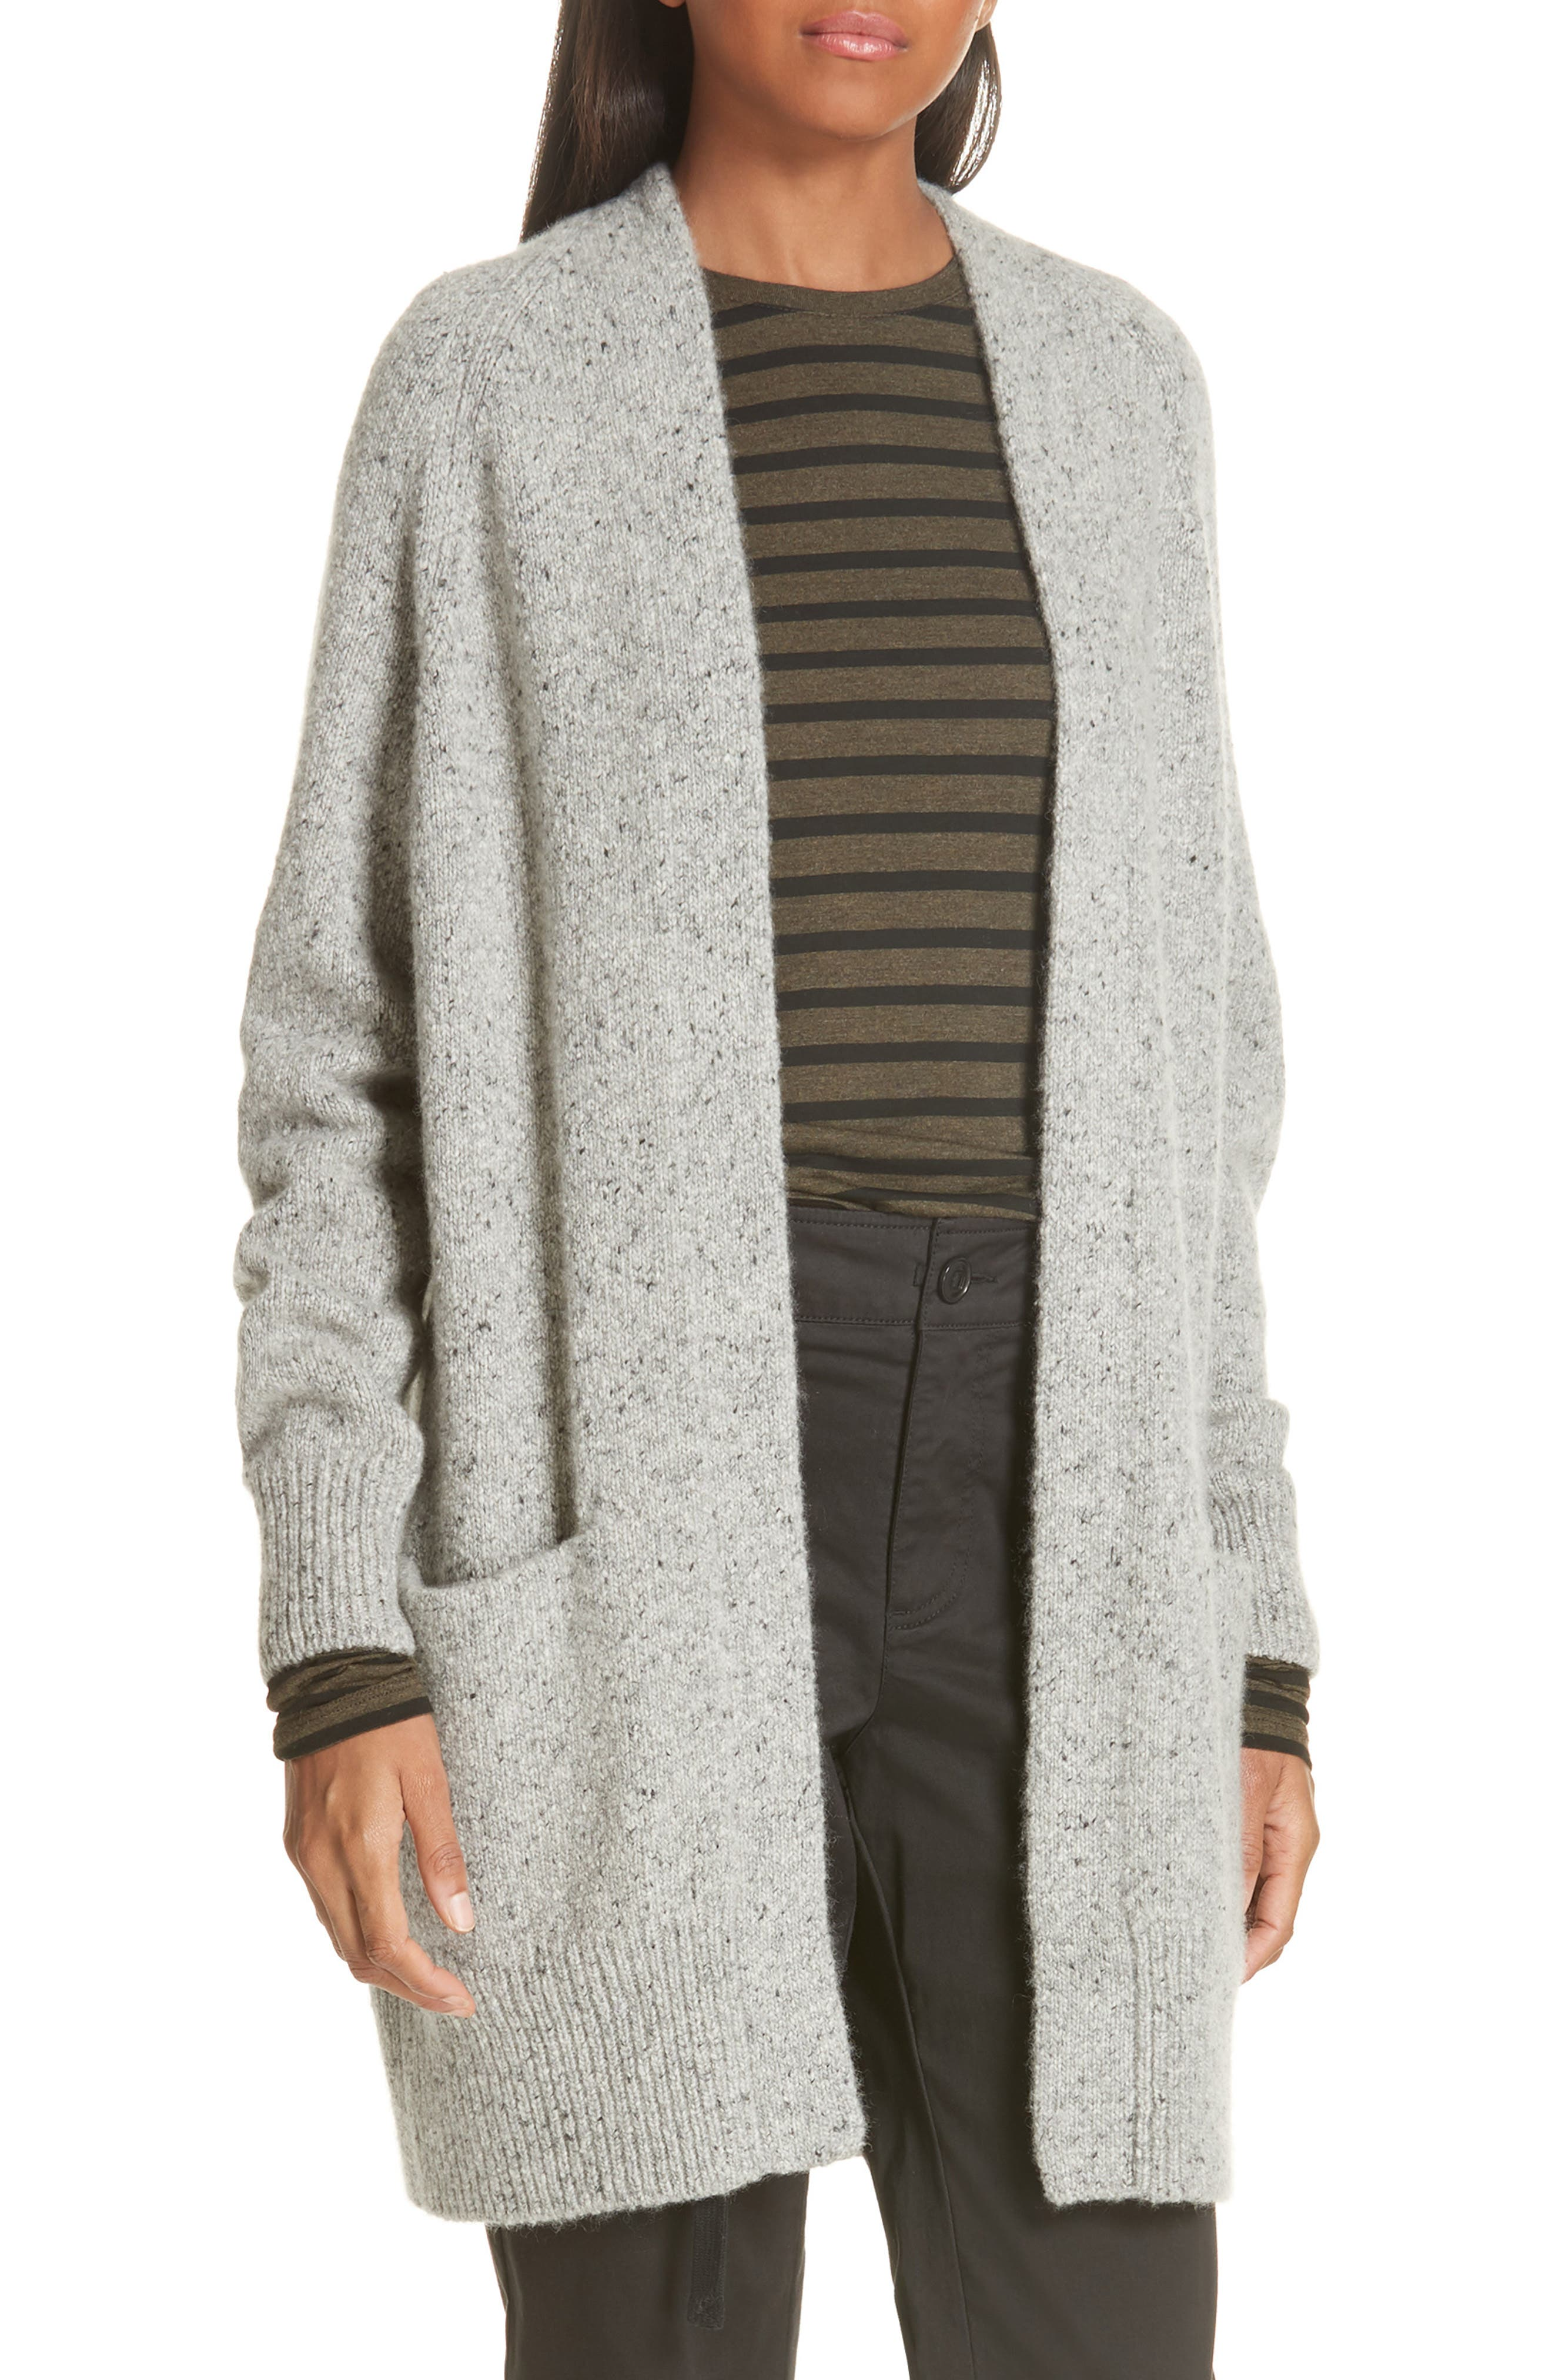 Cashmere Raglan Sleeve Open Front Cardigan,                             Main thumbnail 1, color,                             SOFT GREY